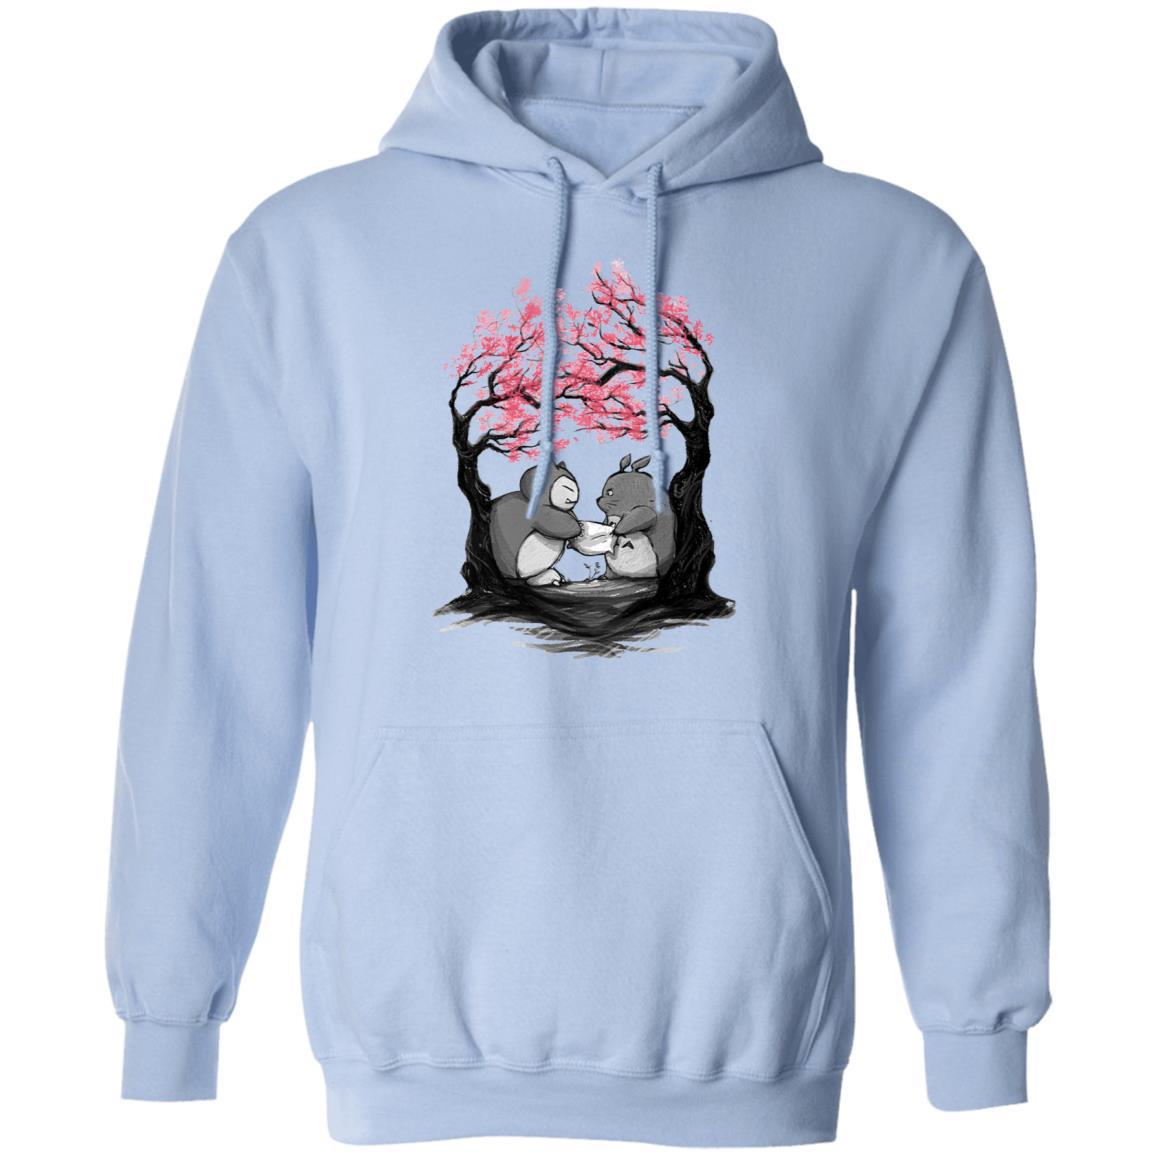 Totoro vs Snorlax Pillow fight Hoodie